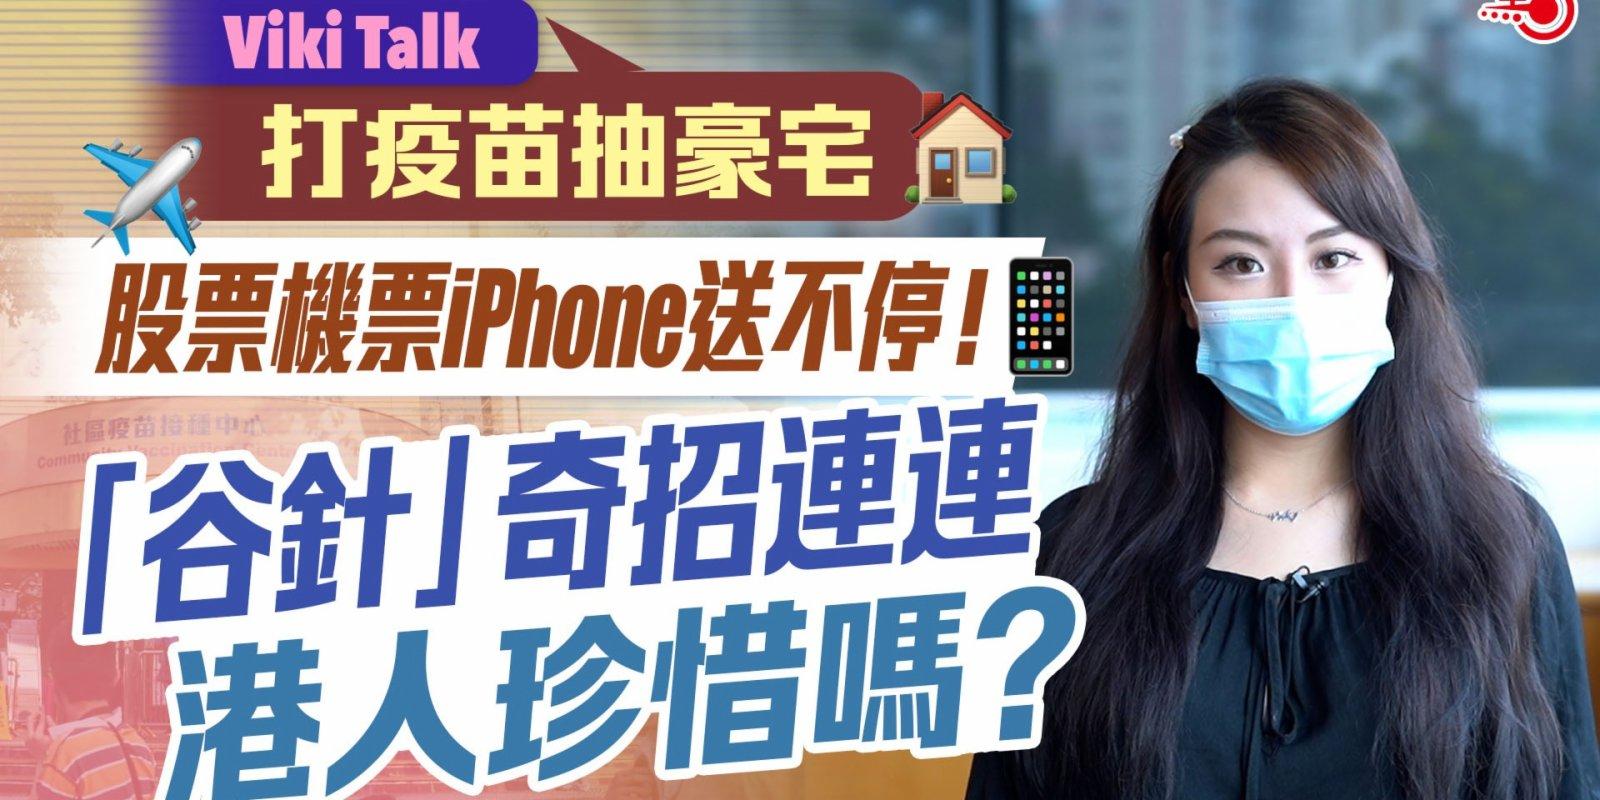 Viki Talk | 打疫苗抽豪宅 股票機票iPhone送不停!「谷針」奇招連連 港人珍惜嗎?